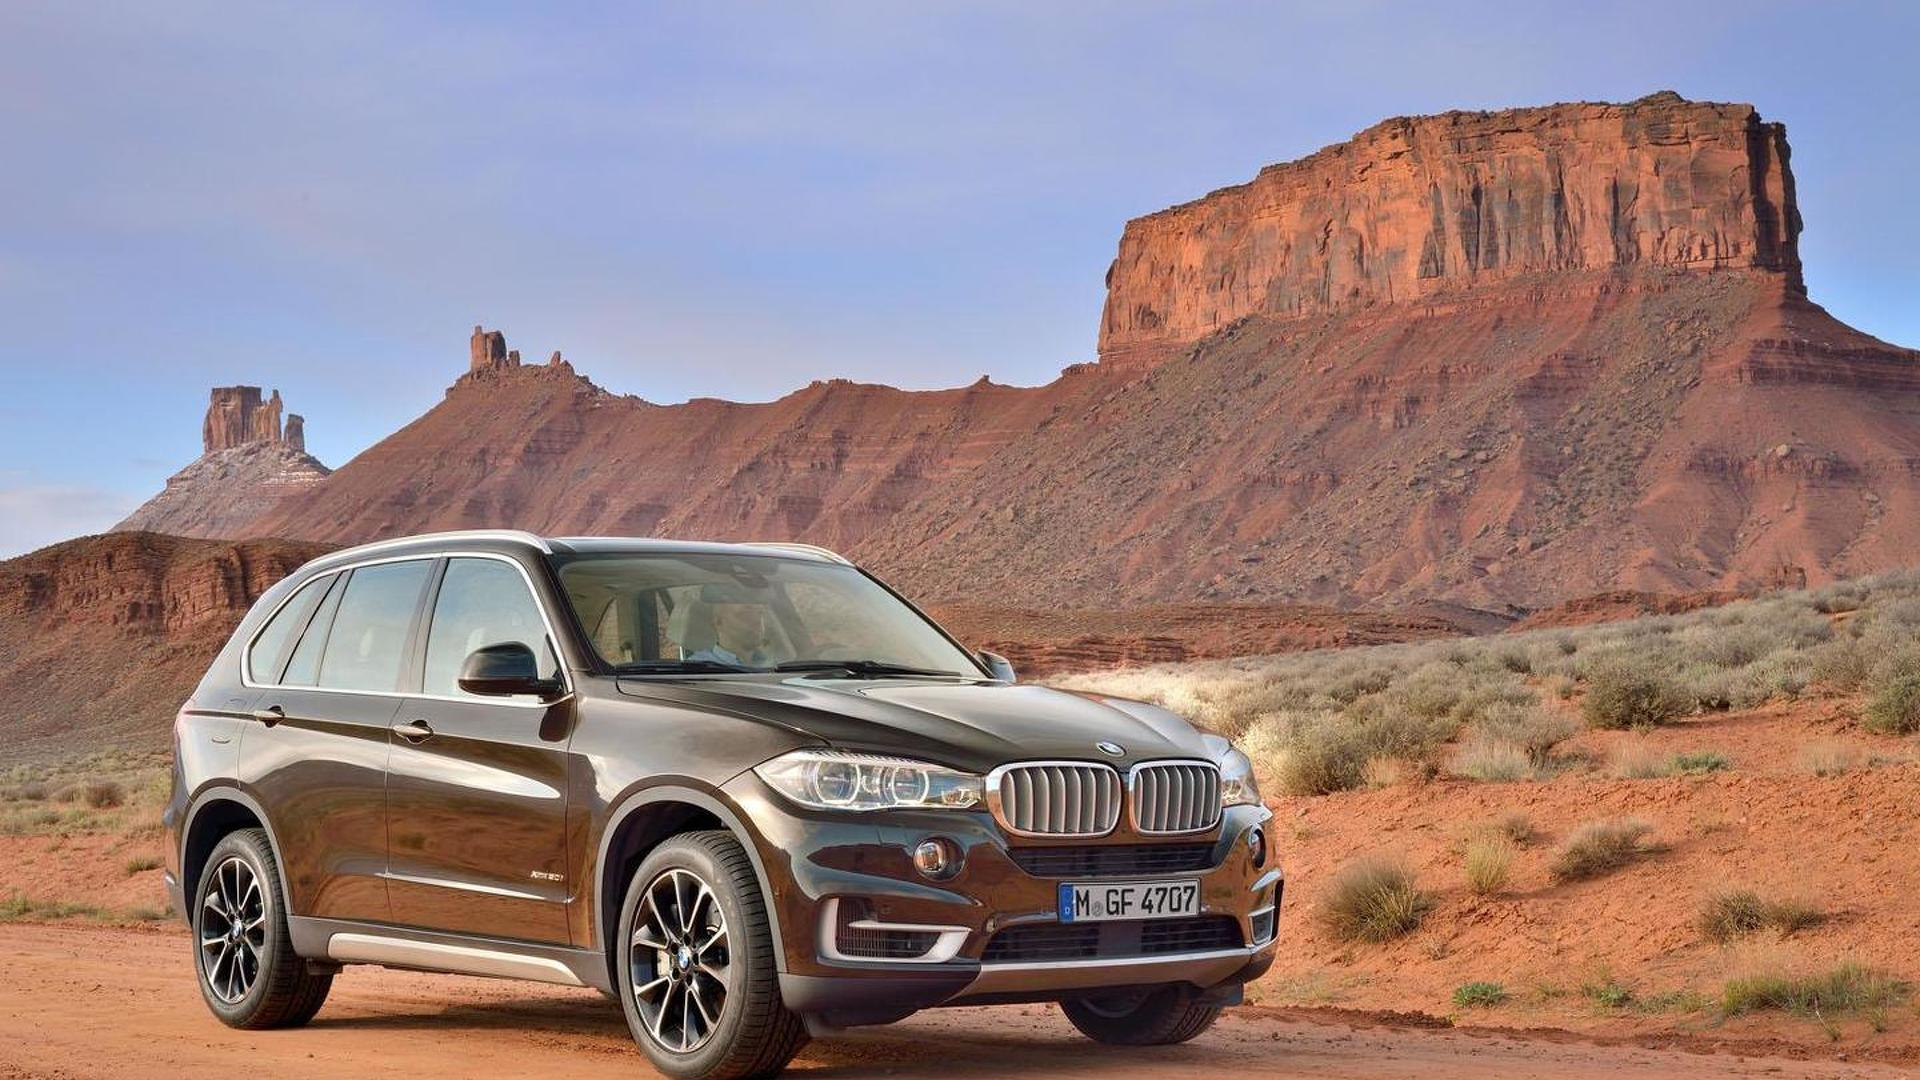 BMW X7 Announced Will Be Built At Their Spartanburg Plant